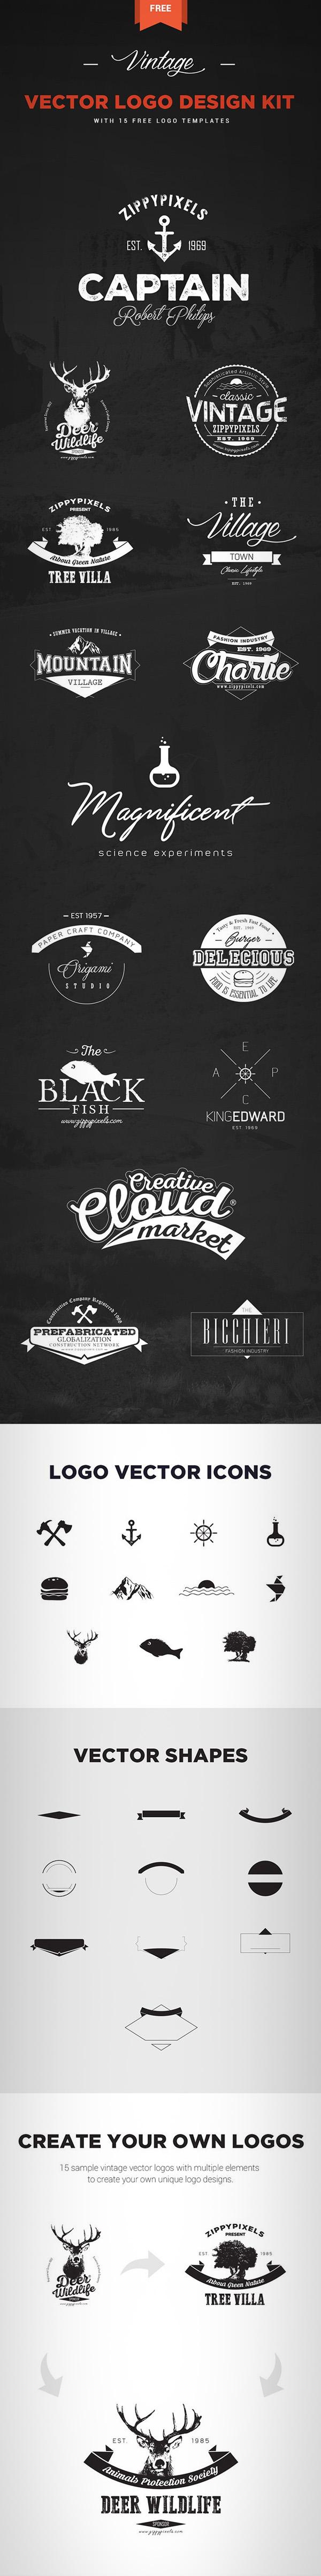 15 Free Vintage Vector Logo Templates and Logo Design Kit